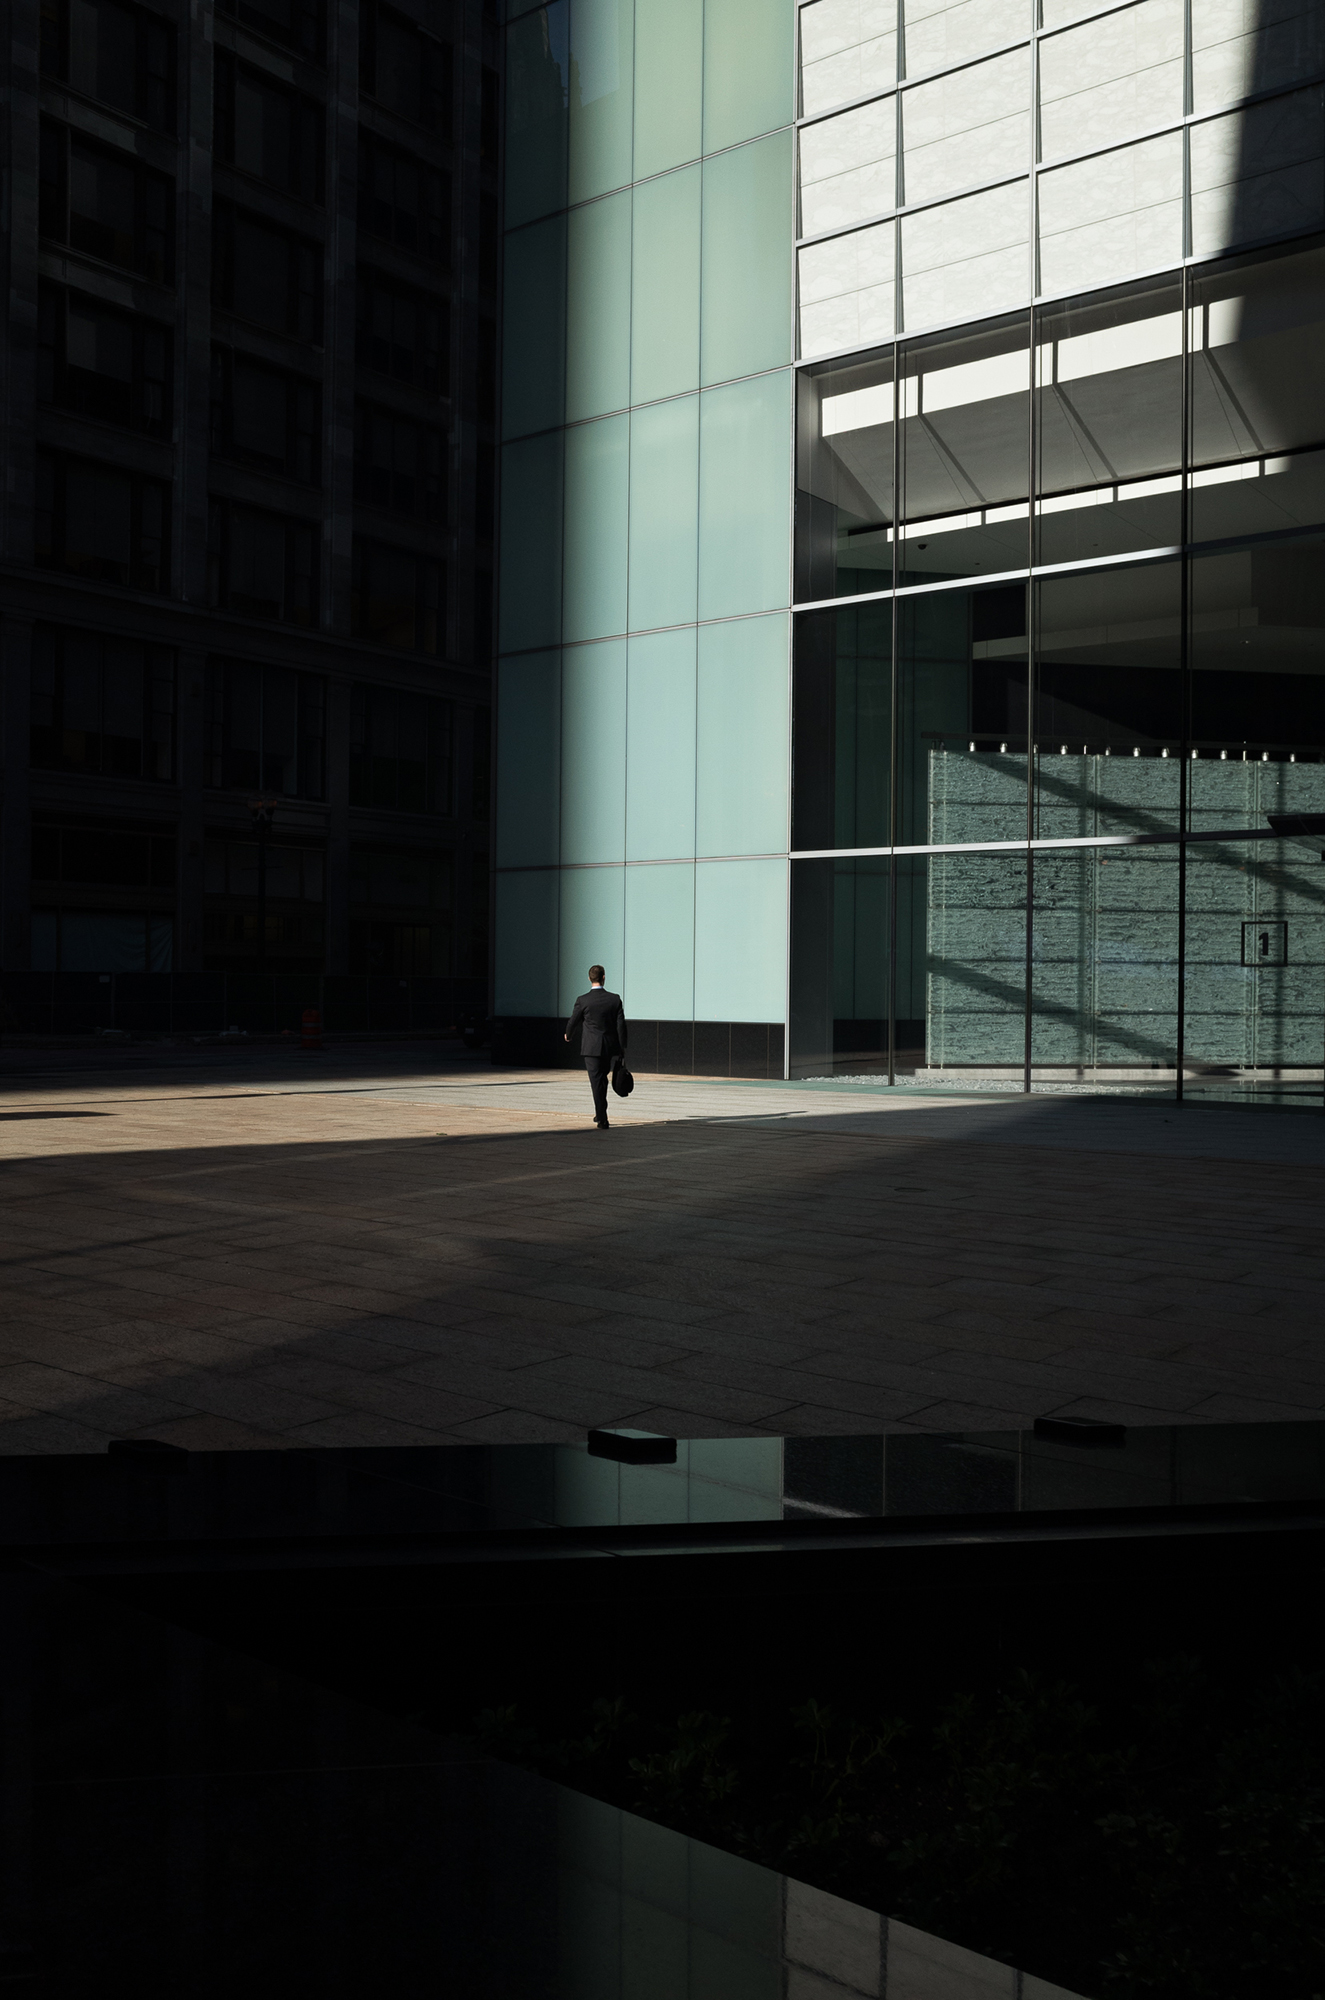 Fernando Villela, Look Forward to See - Untitled (009053), 2015.©Fernando Villela, courtesy Fou Gallery  费尔南多·维利纳,向前预见-无题(009053),2015 © 费尔南多·维利纳,致谢否画廊